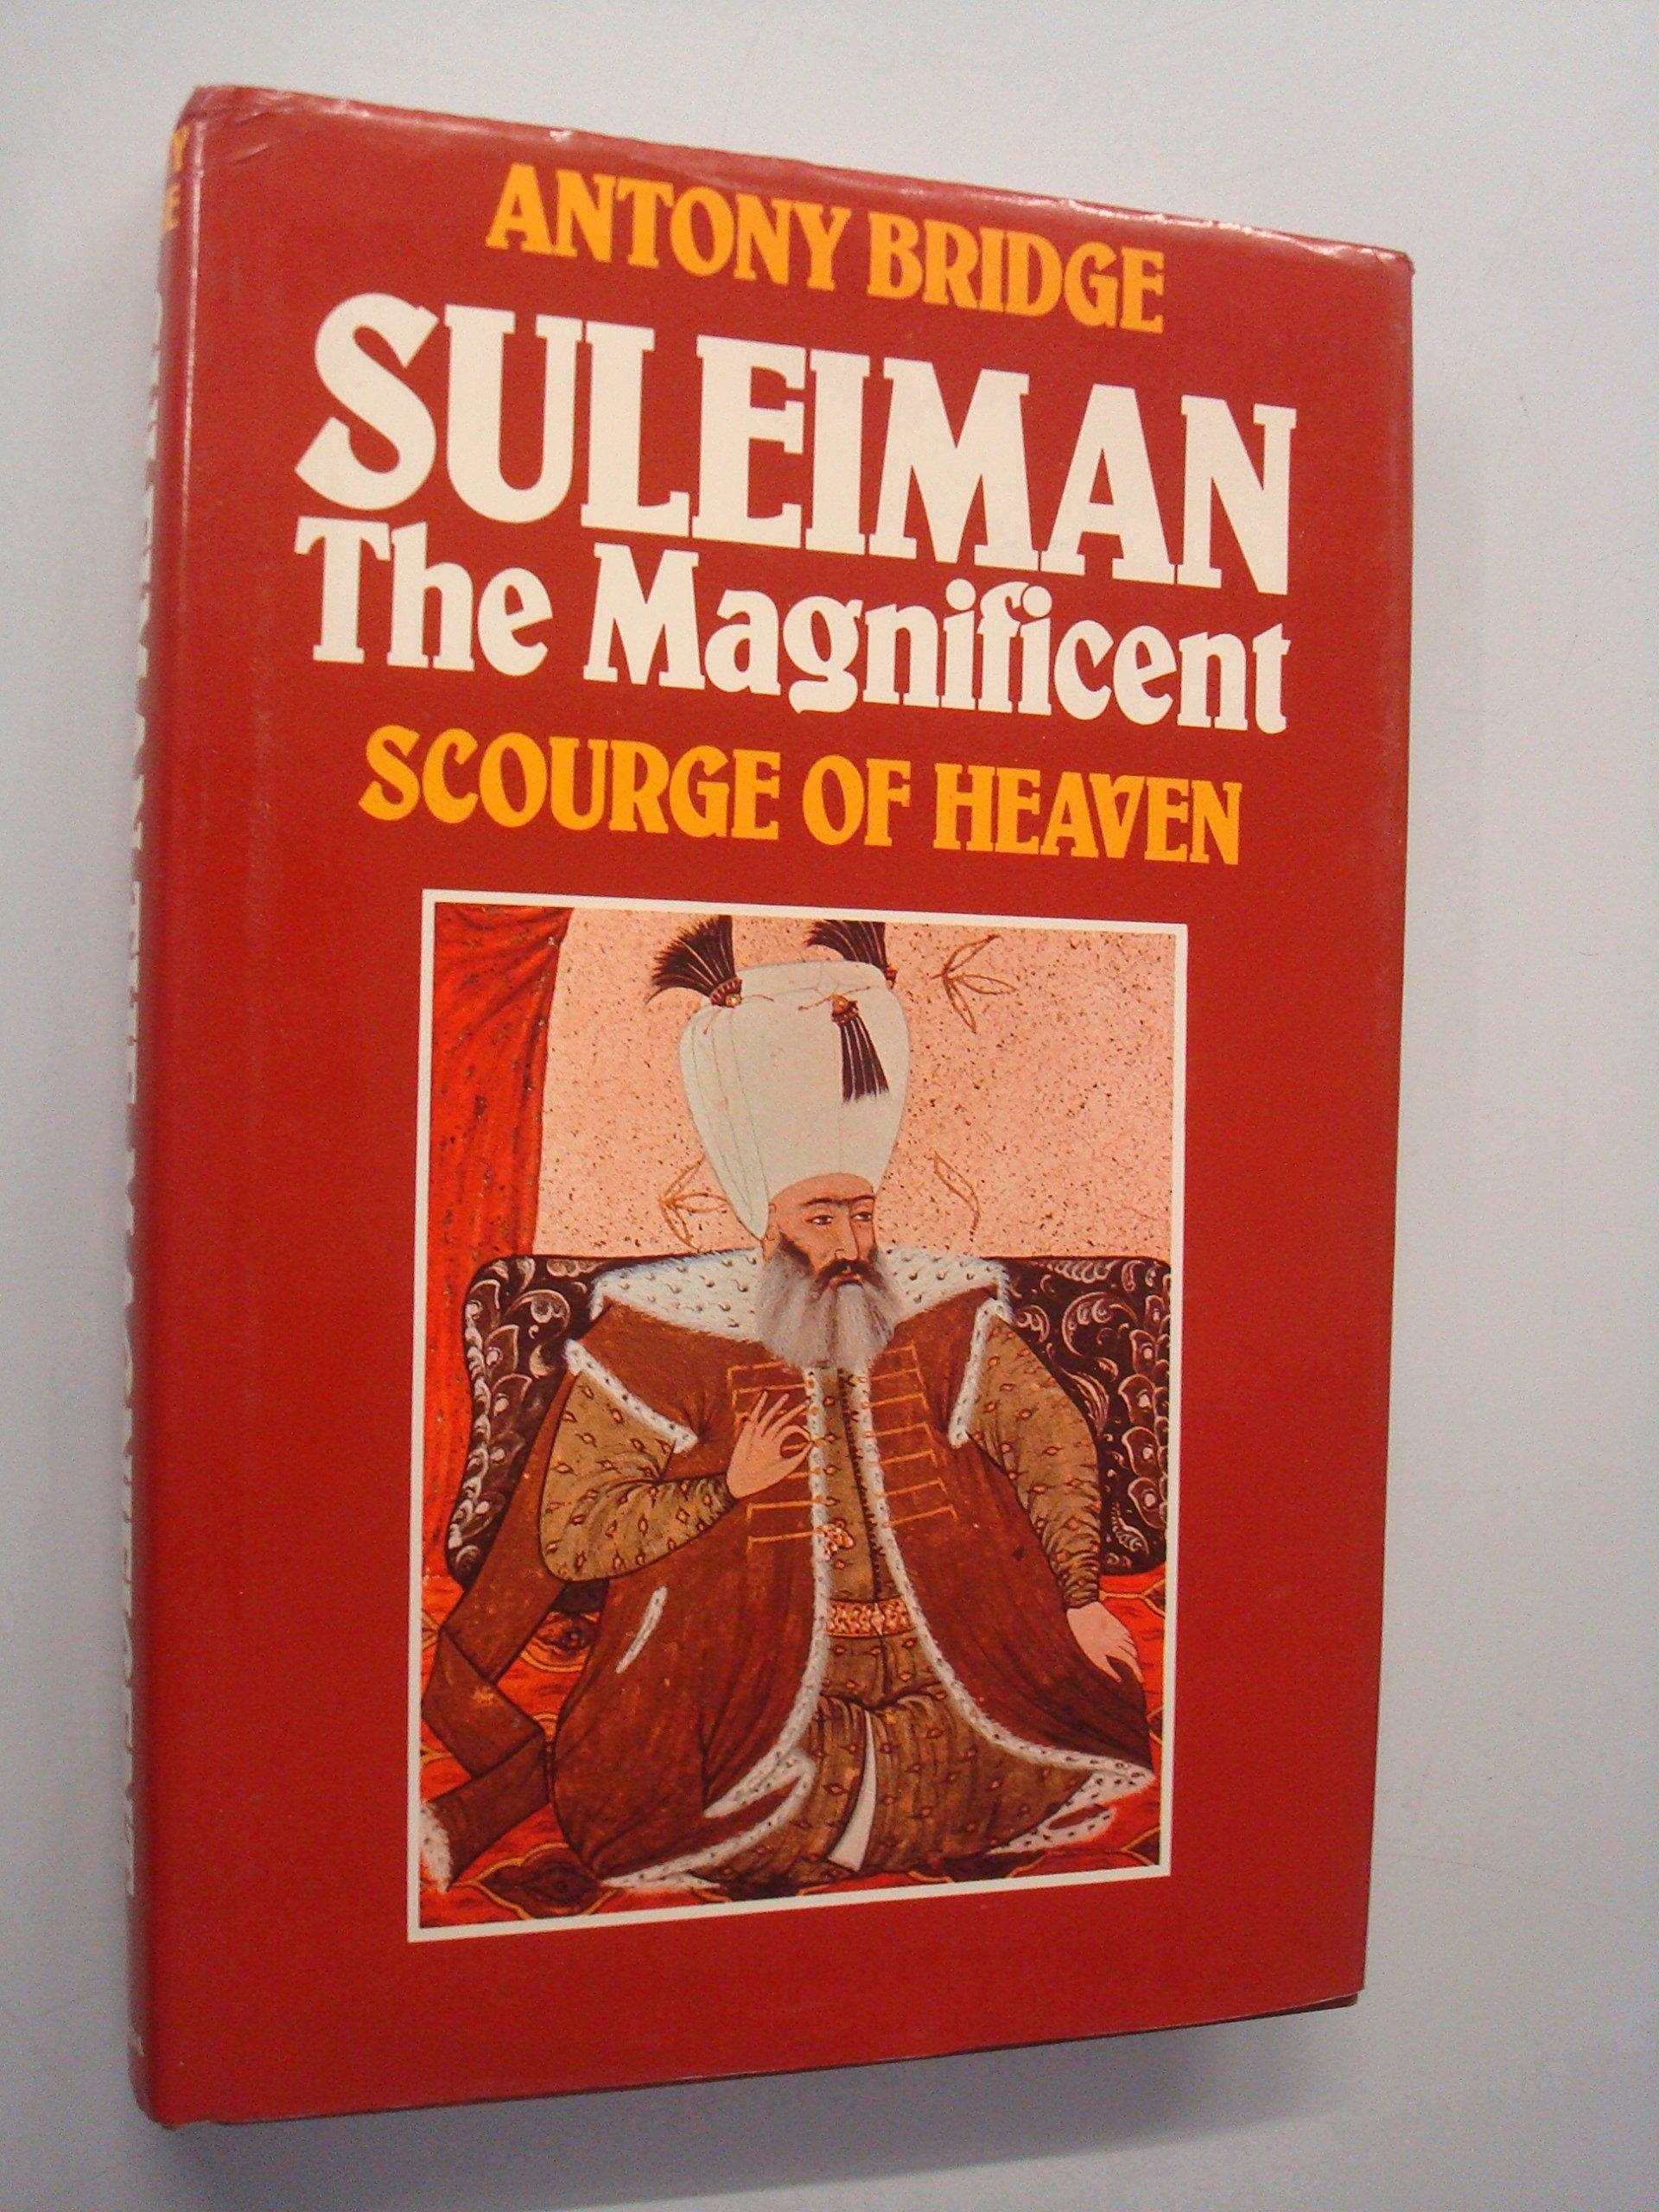 Suleiman the Magnificent: Scourge of Heaven: Amazon.co.uk: Antony Bridge:  9780246116154: Books